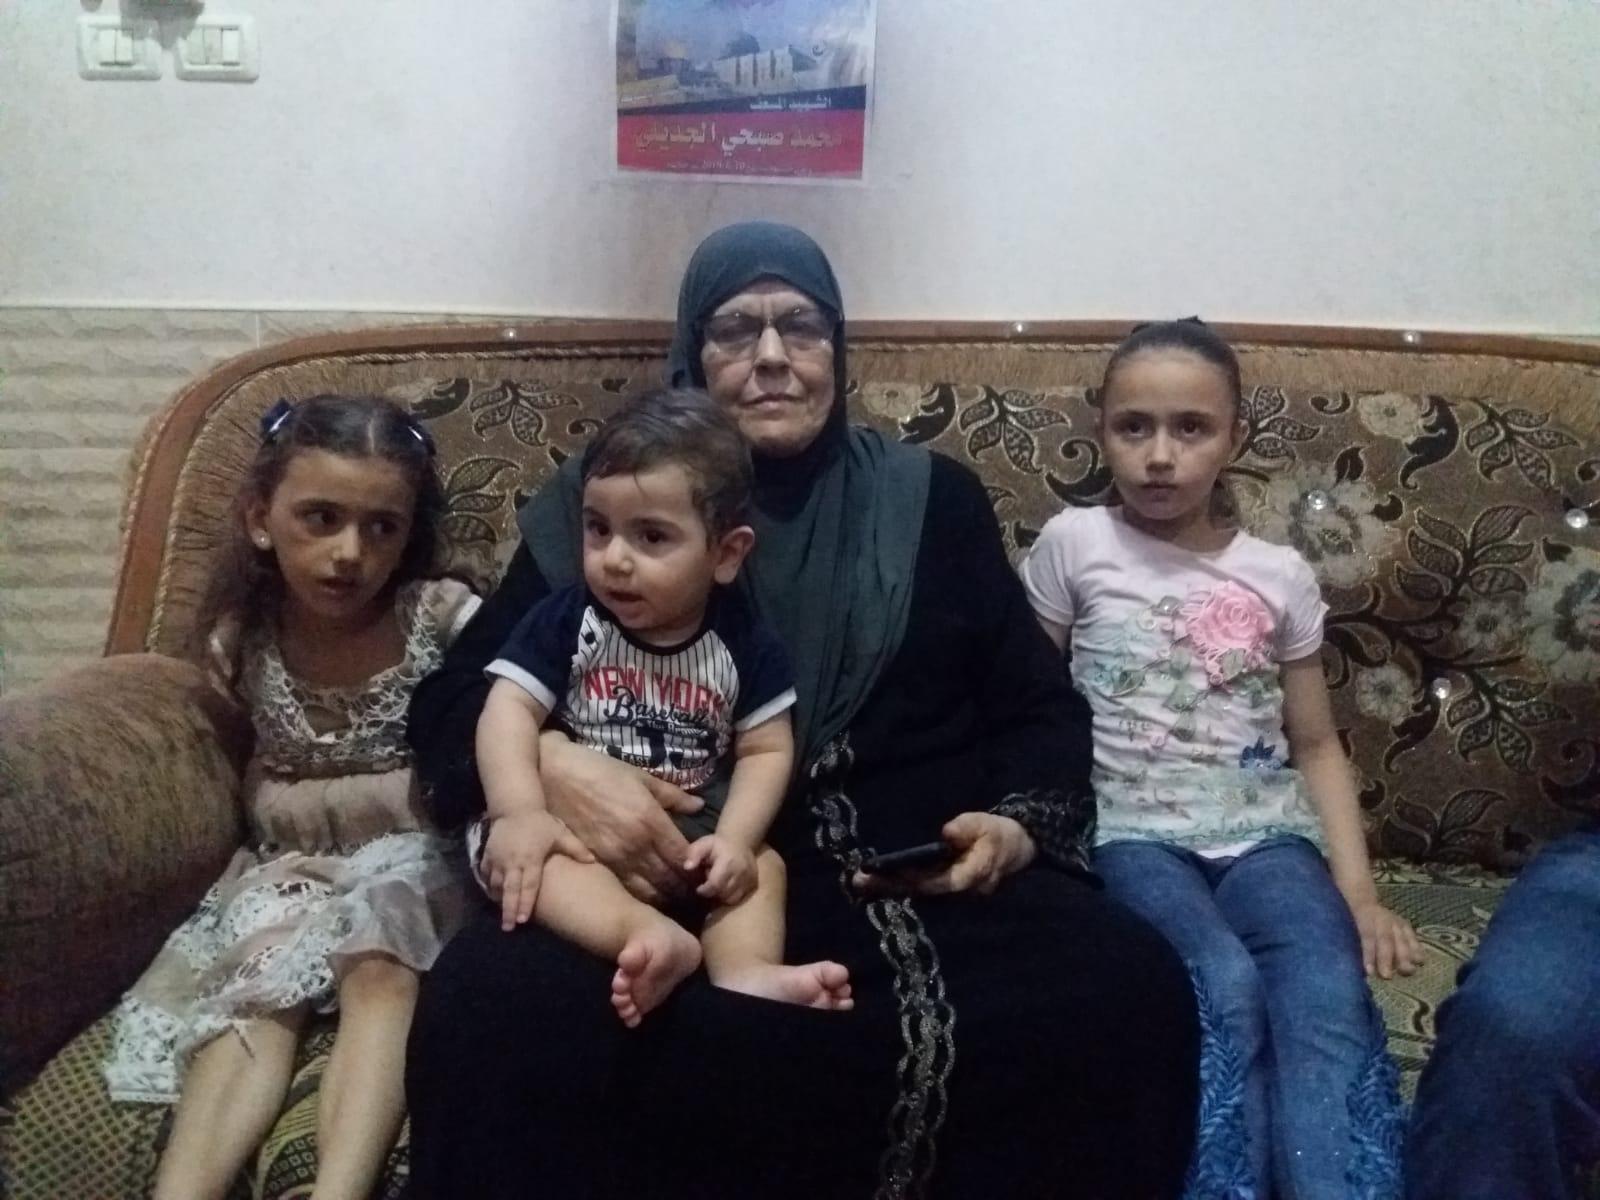 Kifaya Aljadeely, mãe de Mohammad, junto com os filhos de Mohammad. (Foto: Rami Almeghari)